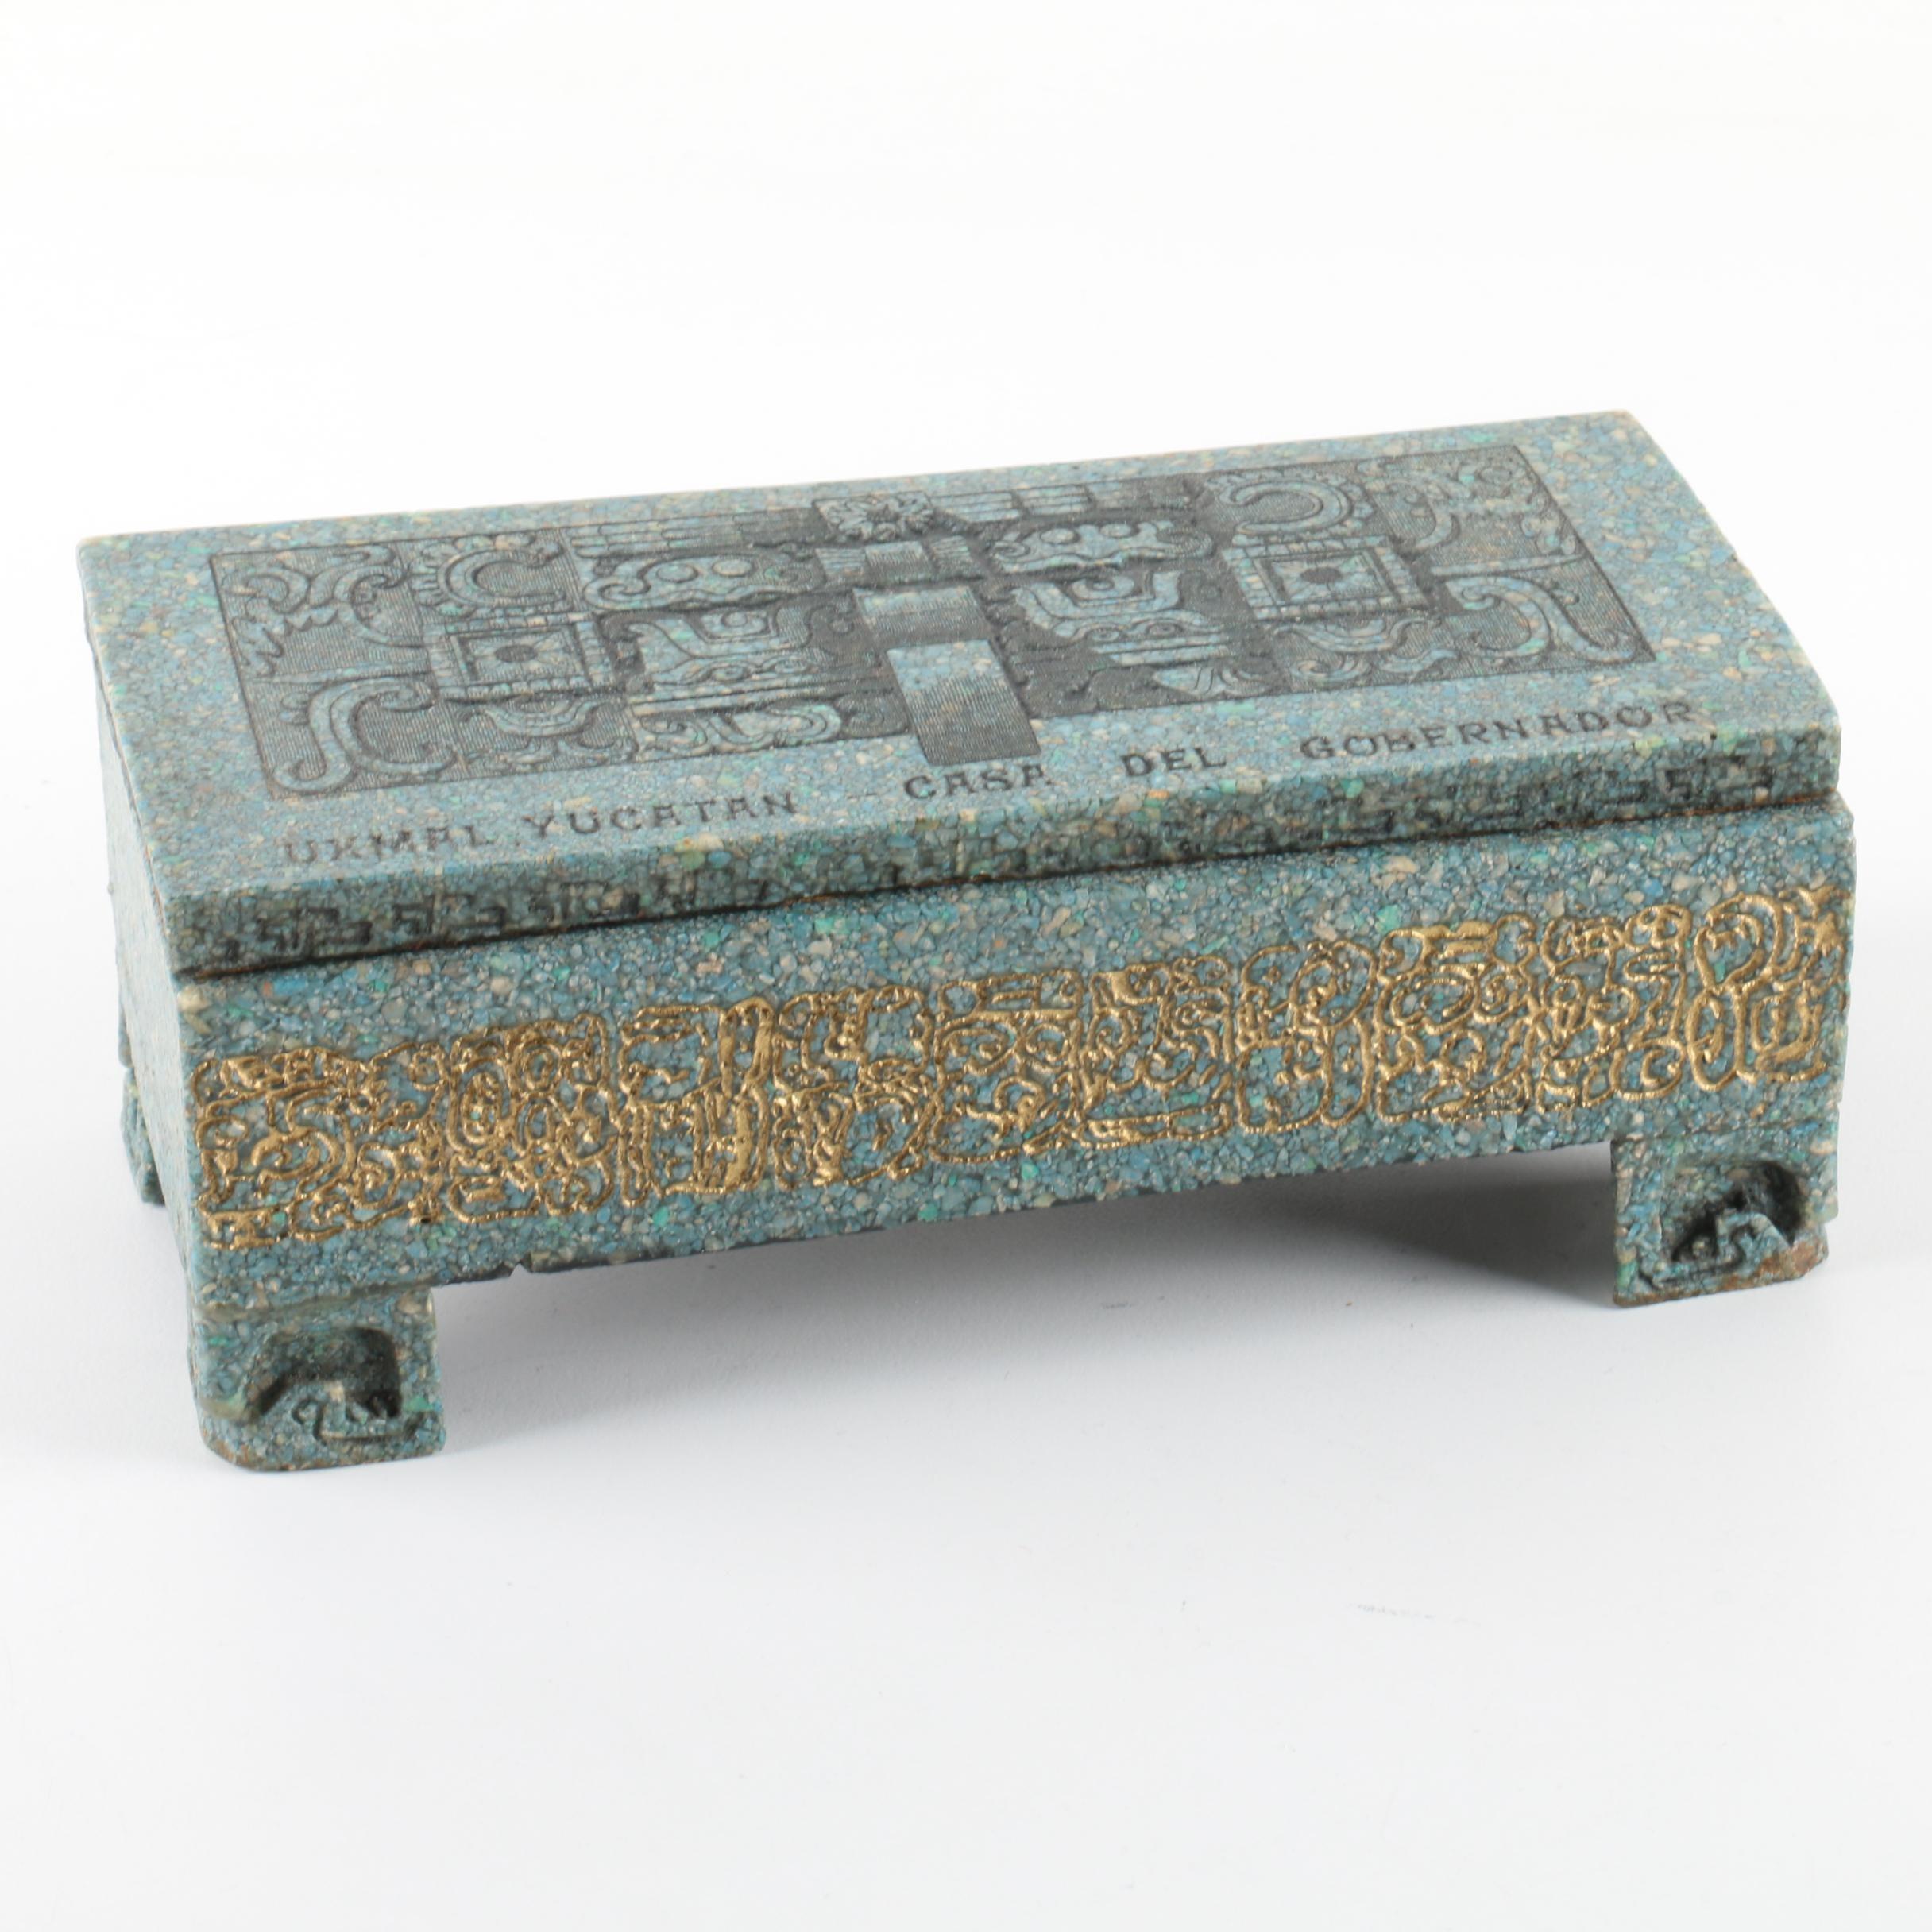 Dyed Chip Trinket Box